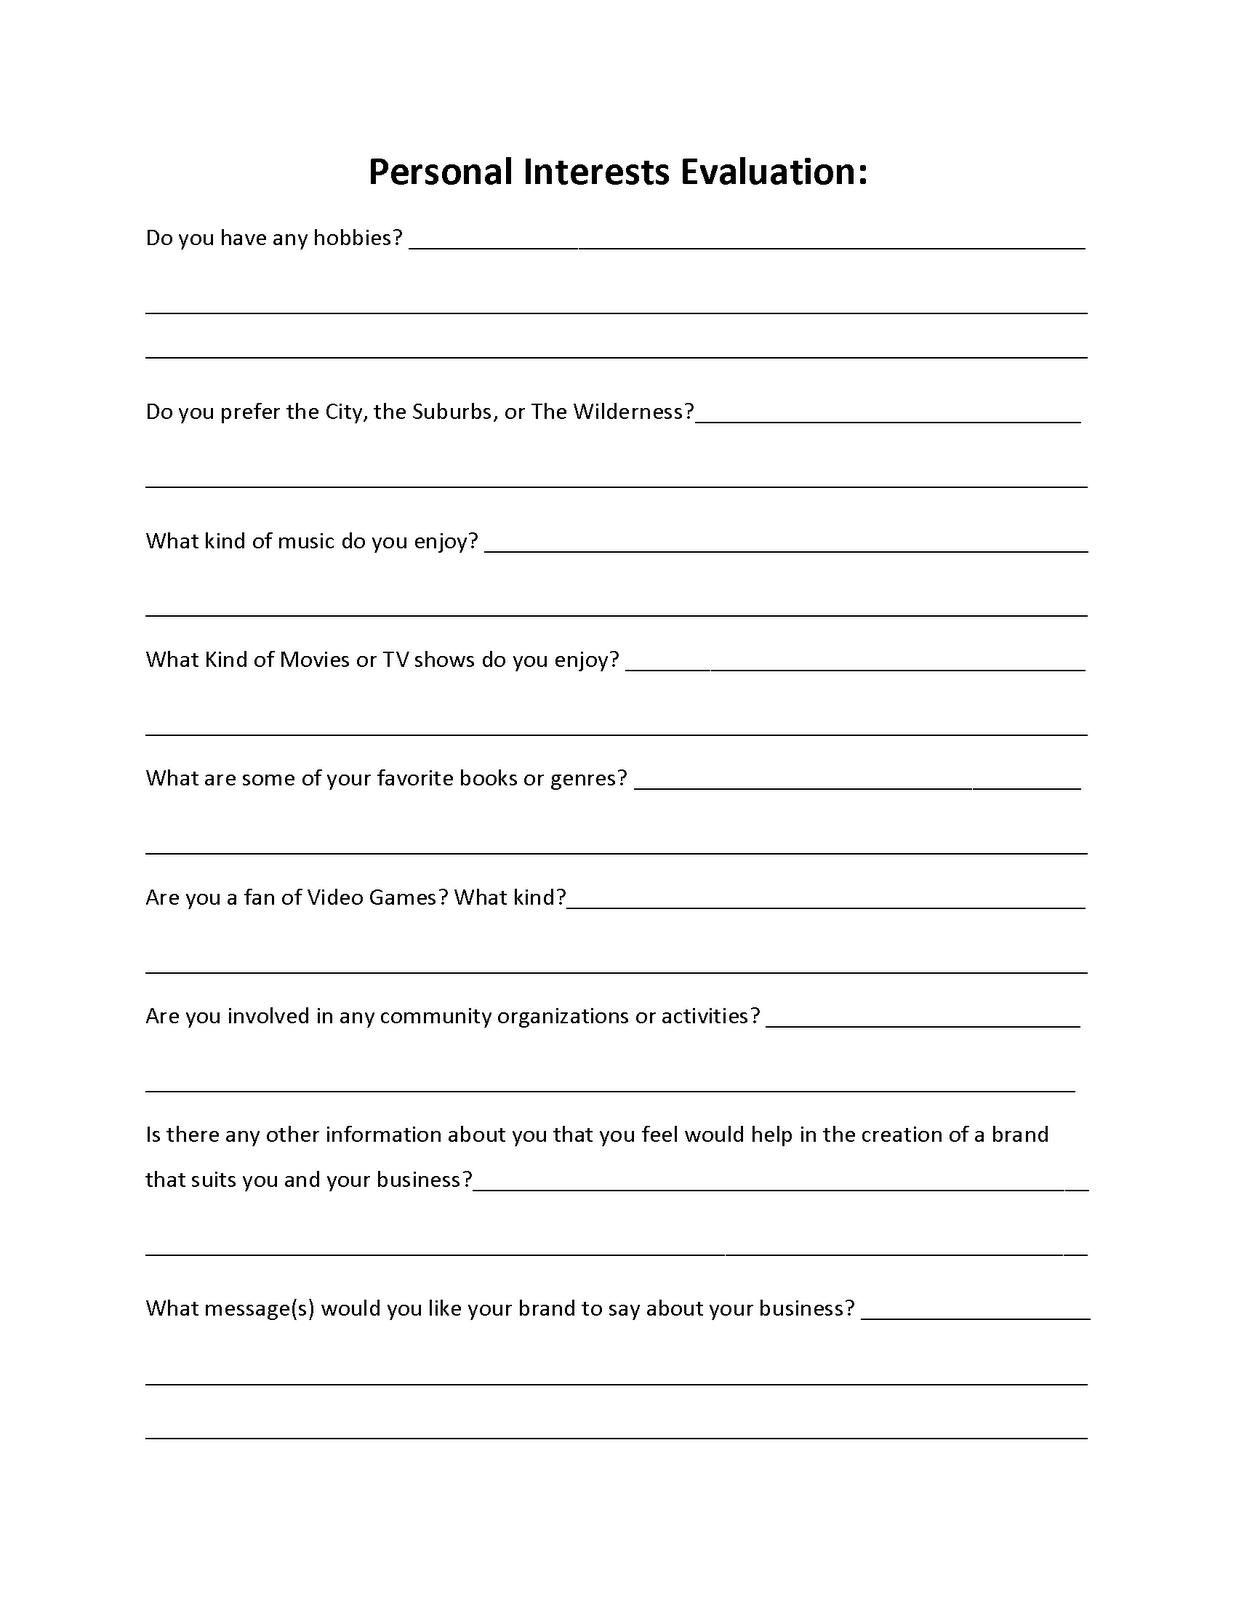 Covert S Creative Corner Client Assessment Form